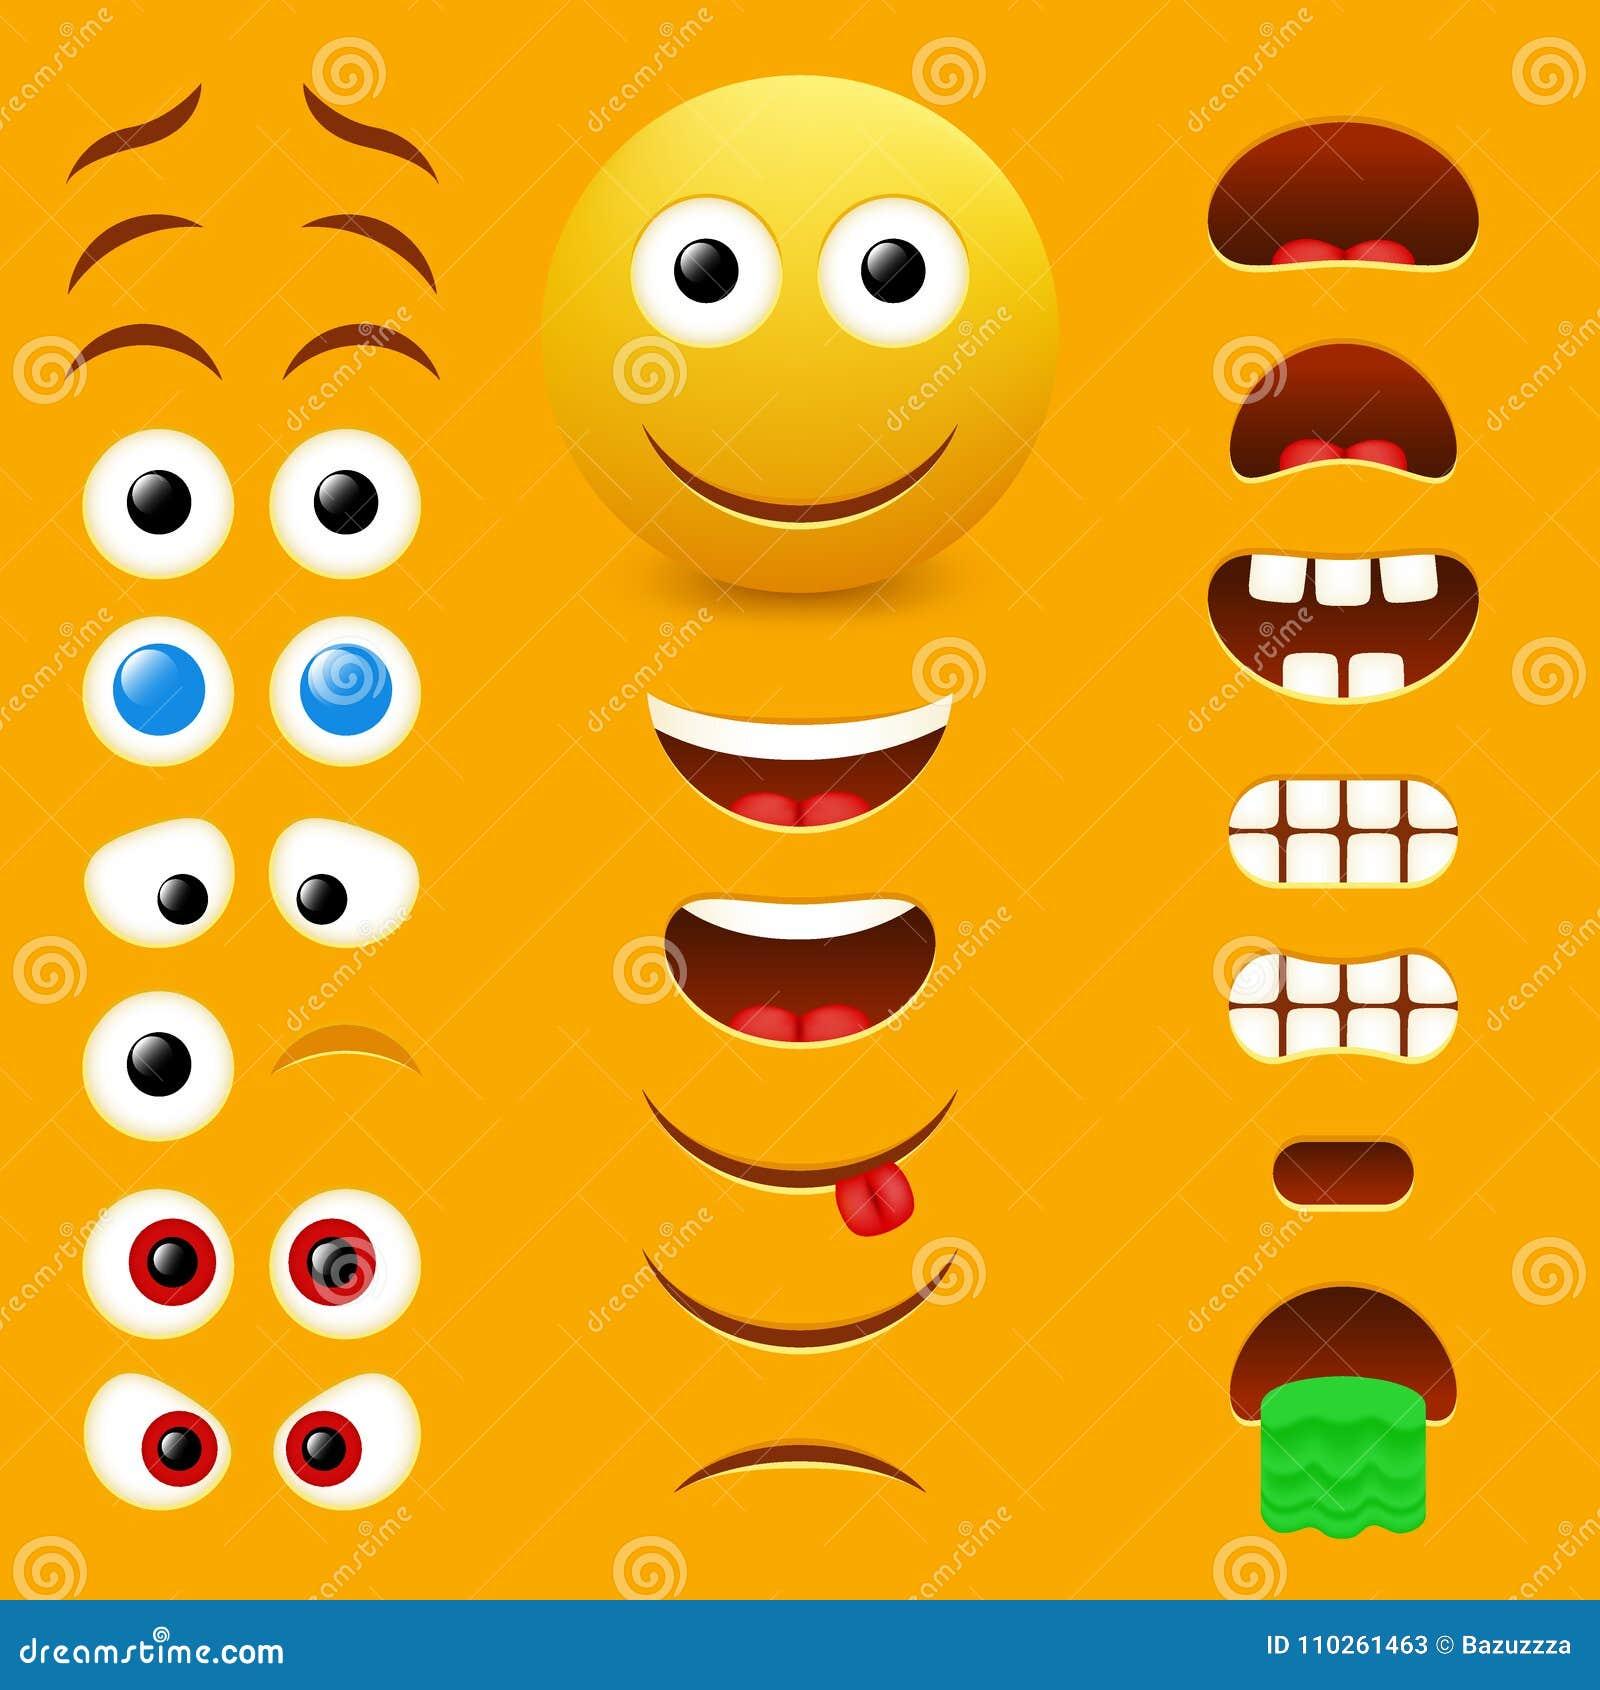 Emoticon maker download